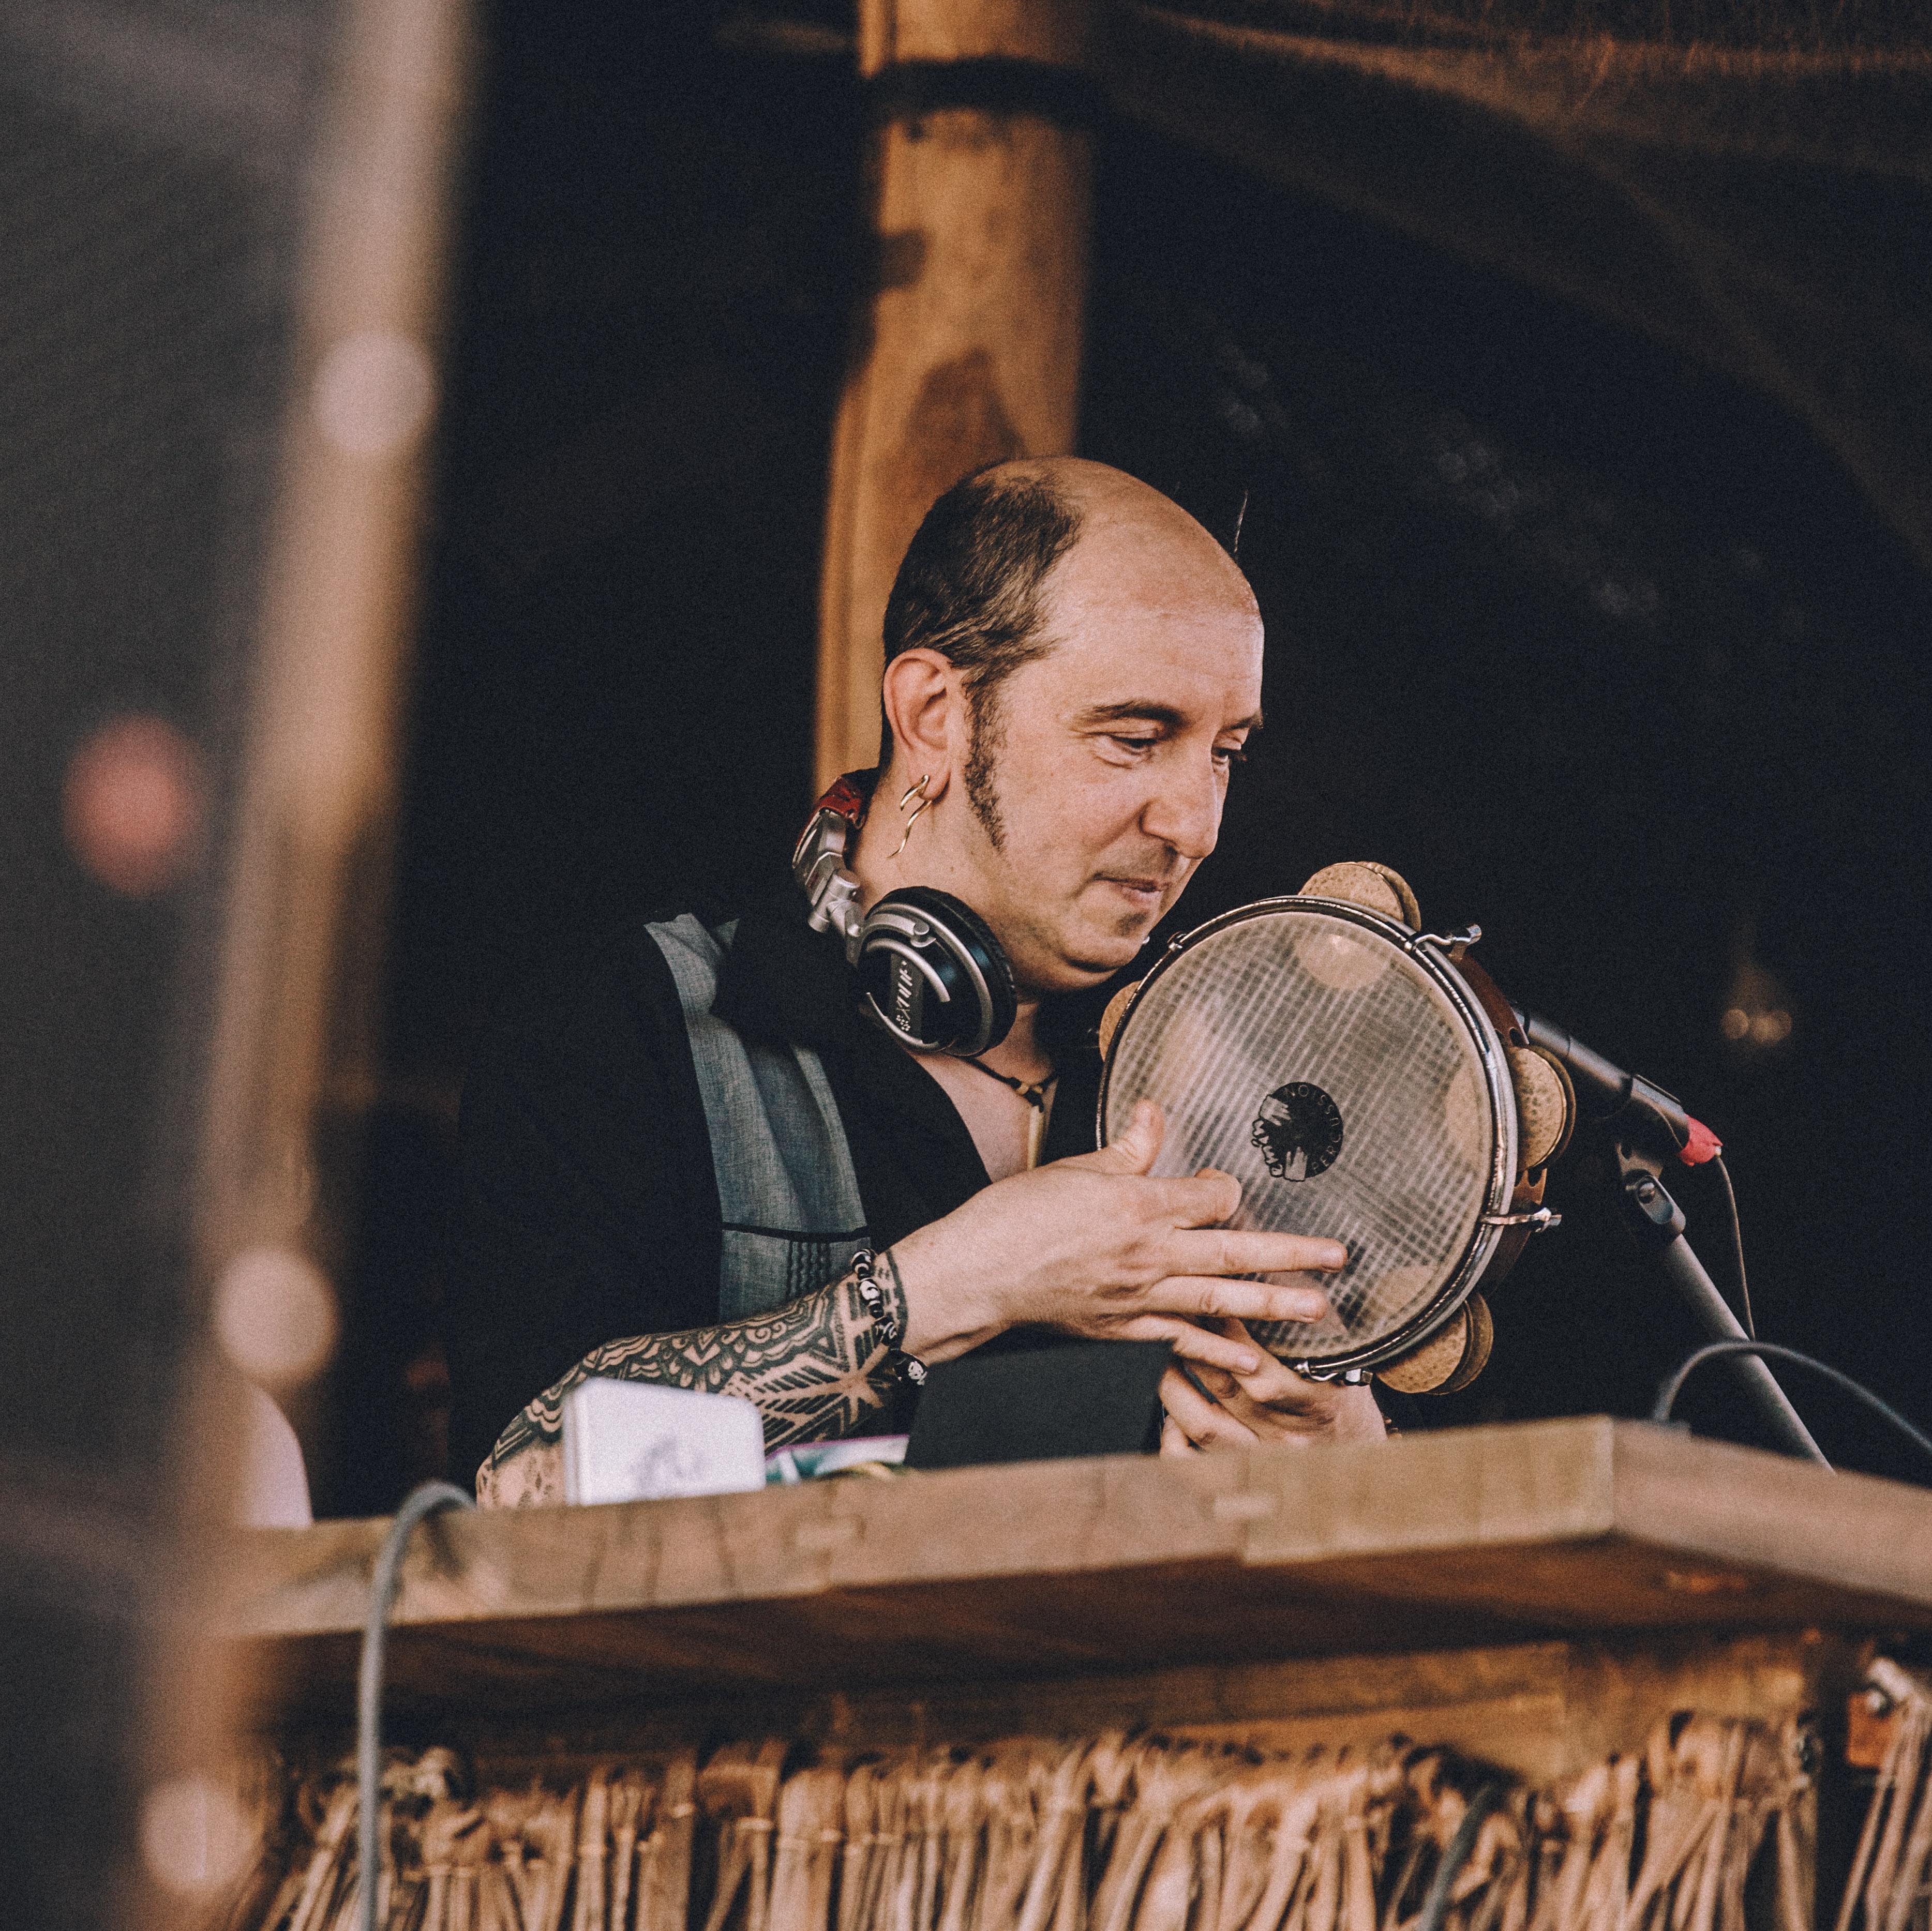 Mercan Dede musician interview Scorpios Mykonos Turkish music